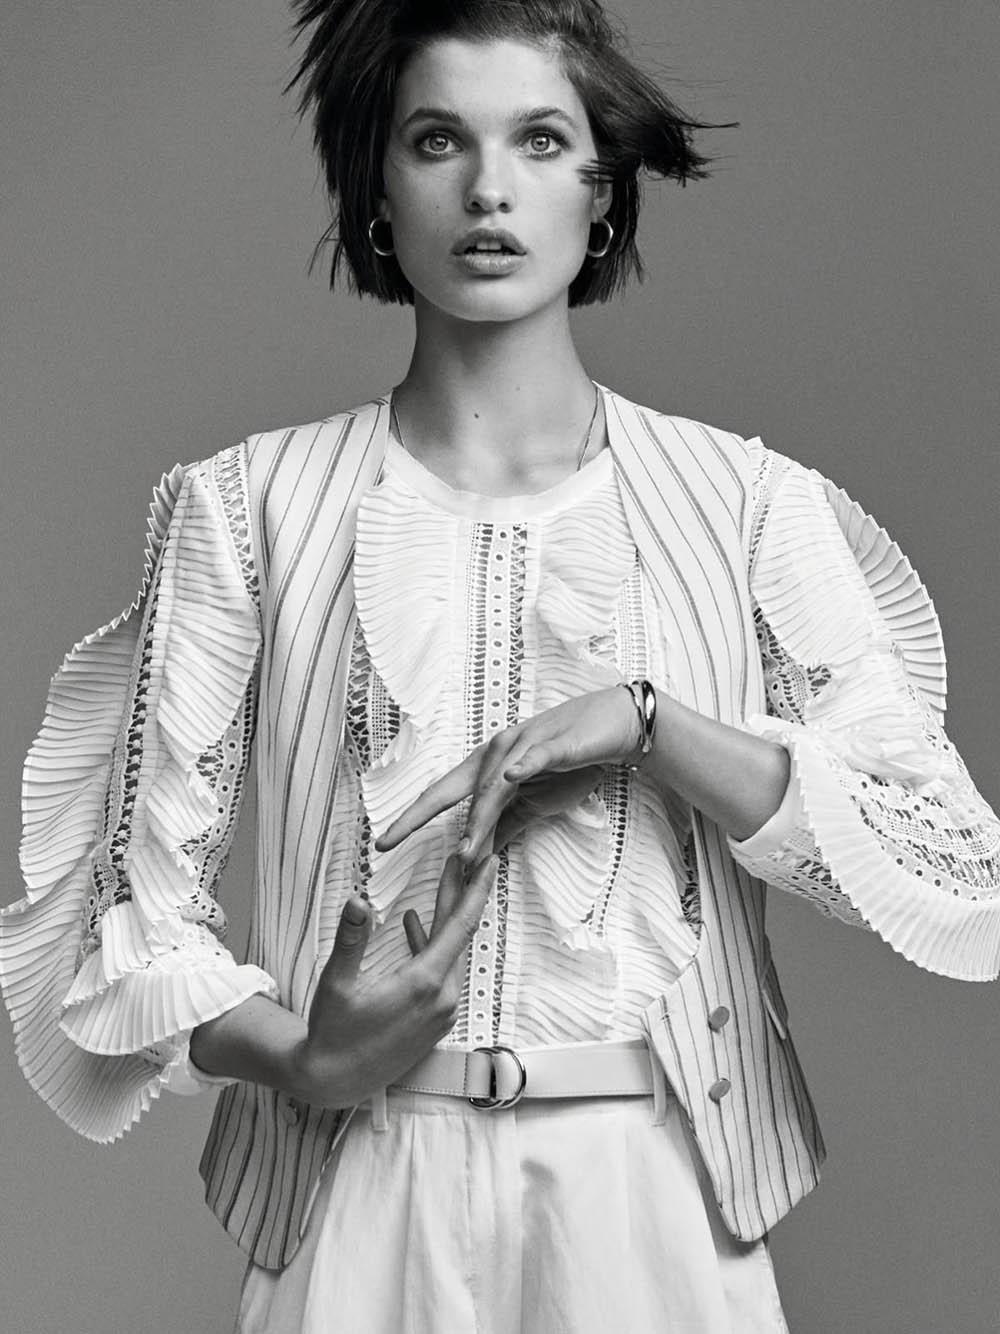 Julia van Os by Nathaniel Goldberg for Vogue Paris April 2019